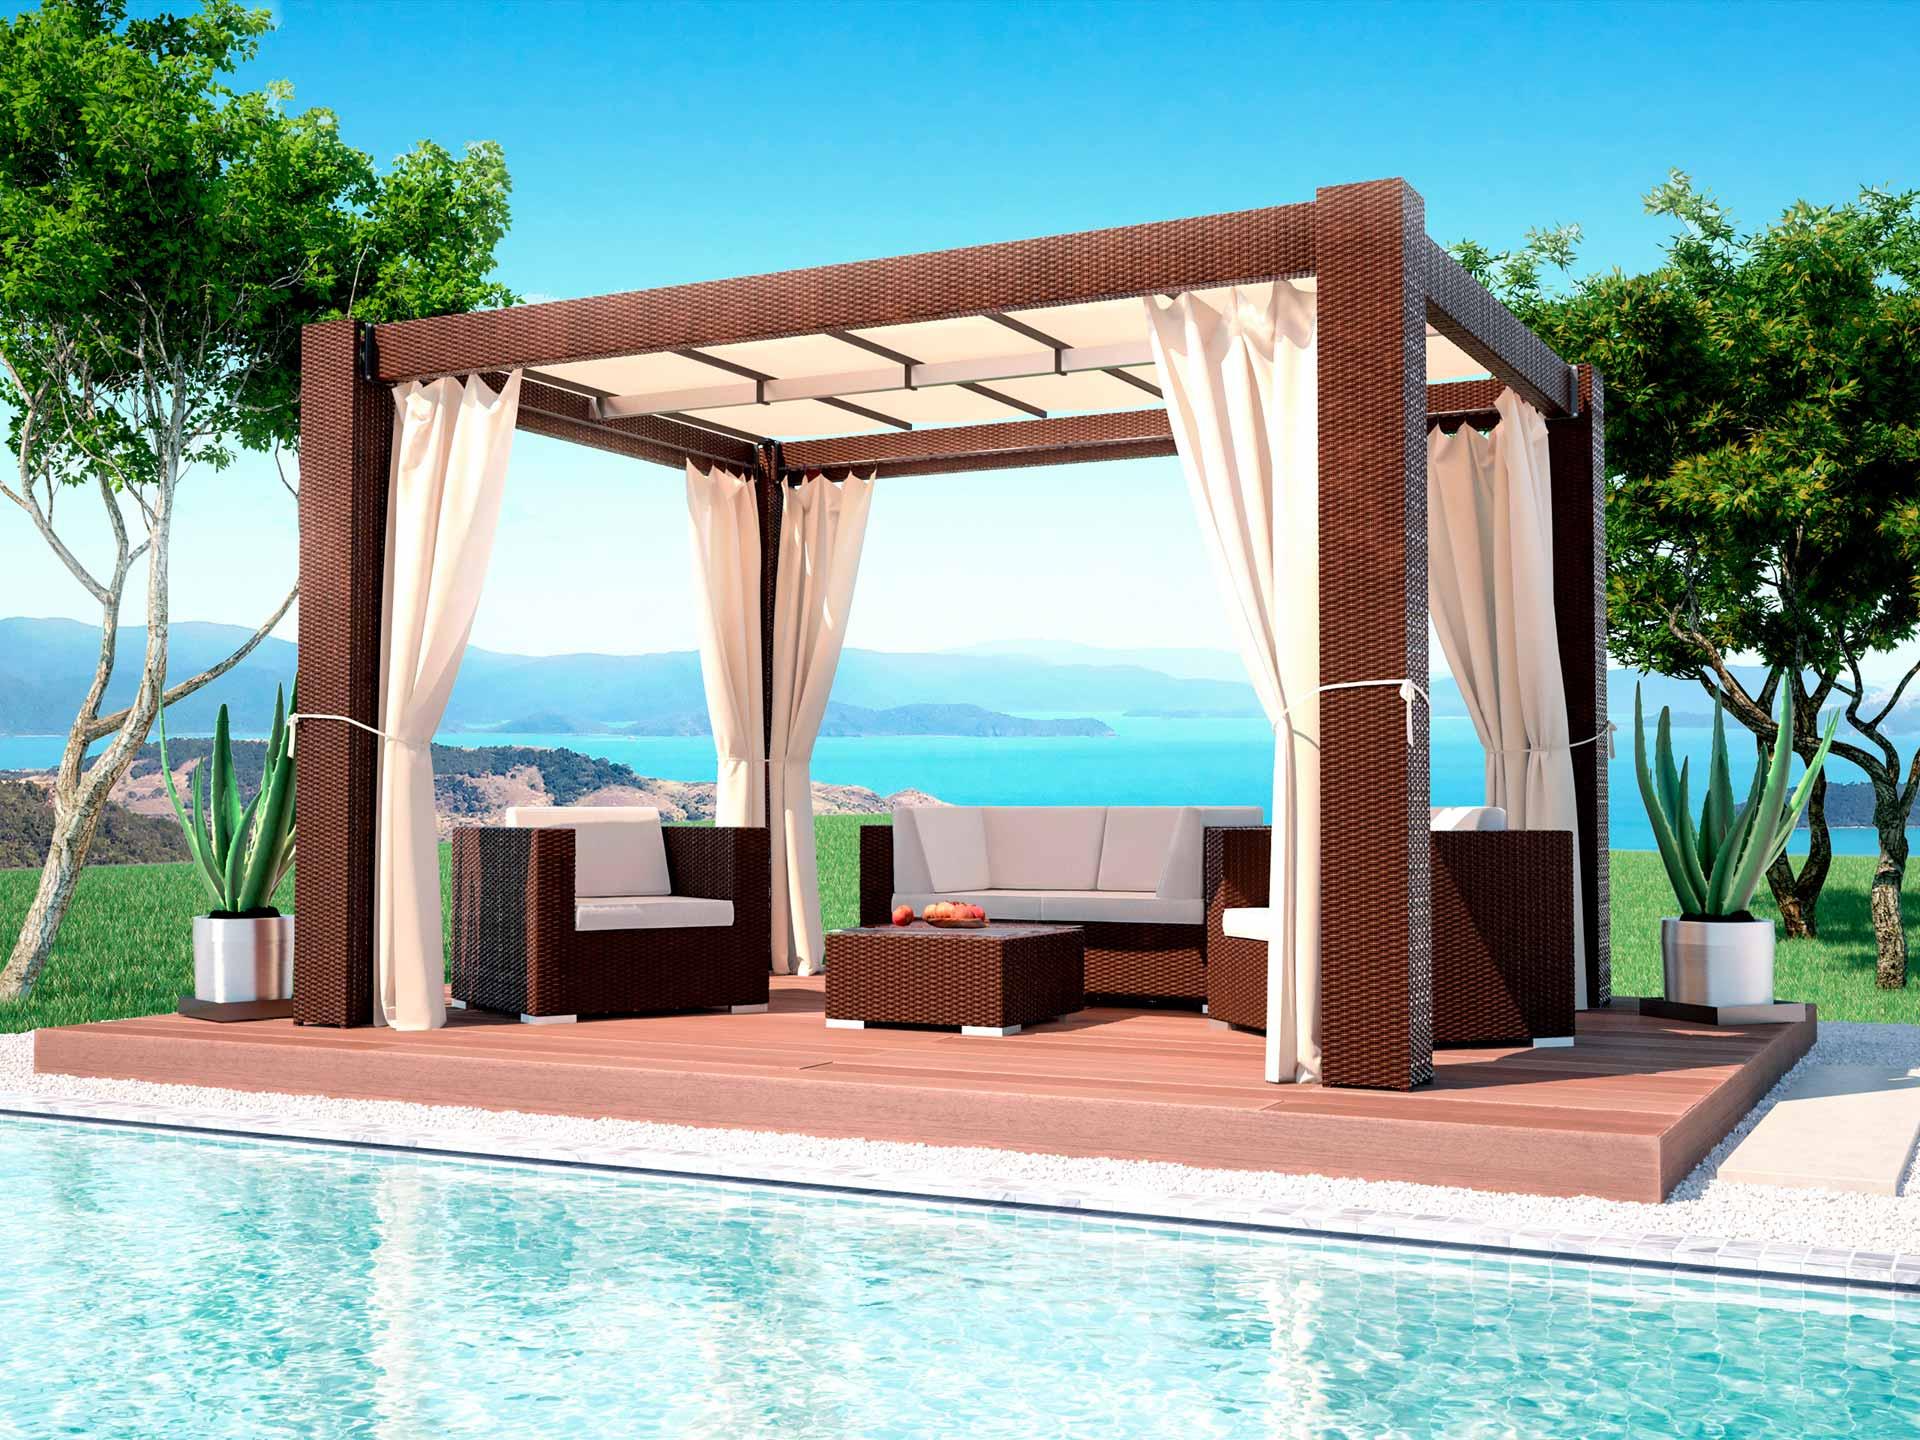 artelia fr tonnelle pergola originale r sine tress e paloma 4mx3m. Black Bedroom Furniture Sets. Home Design Ideas